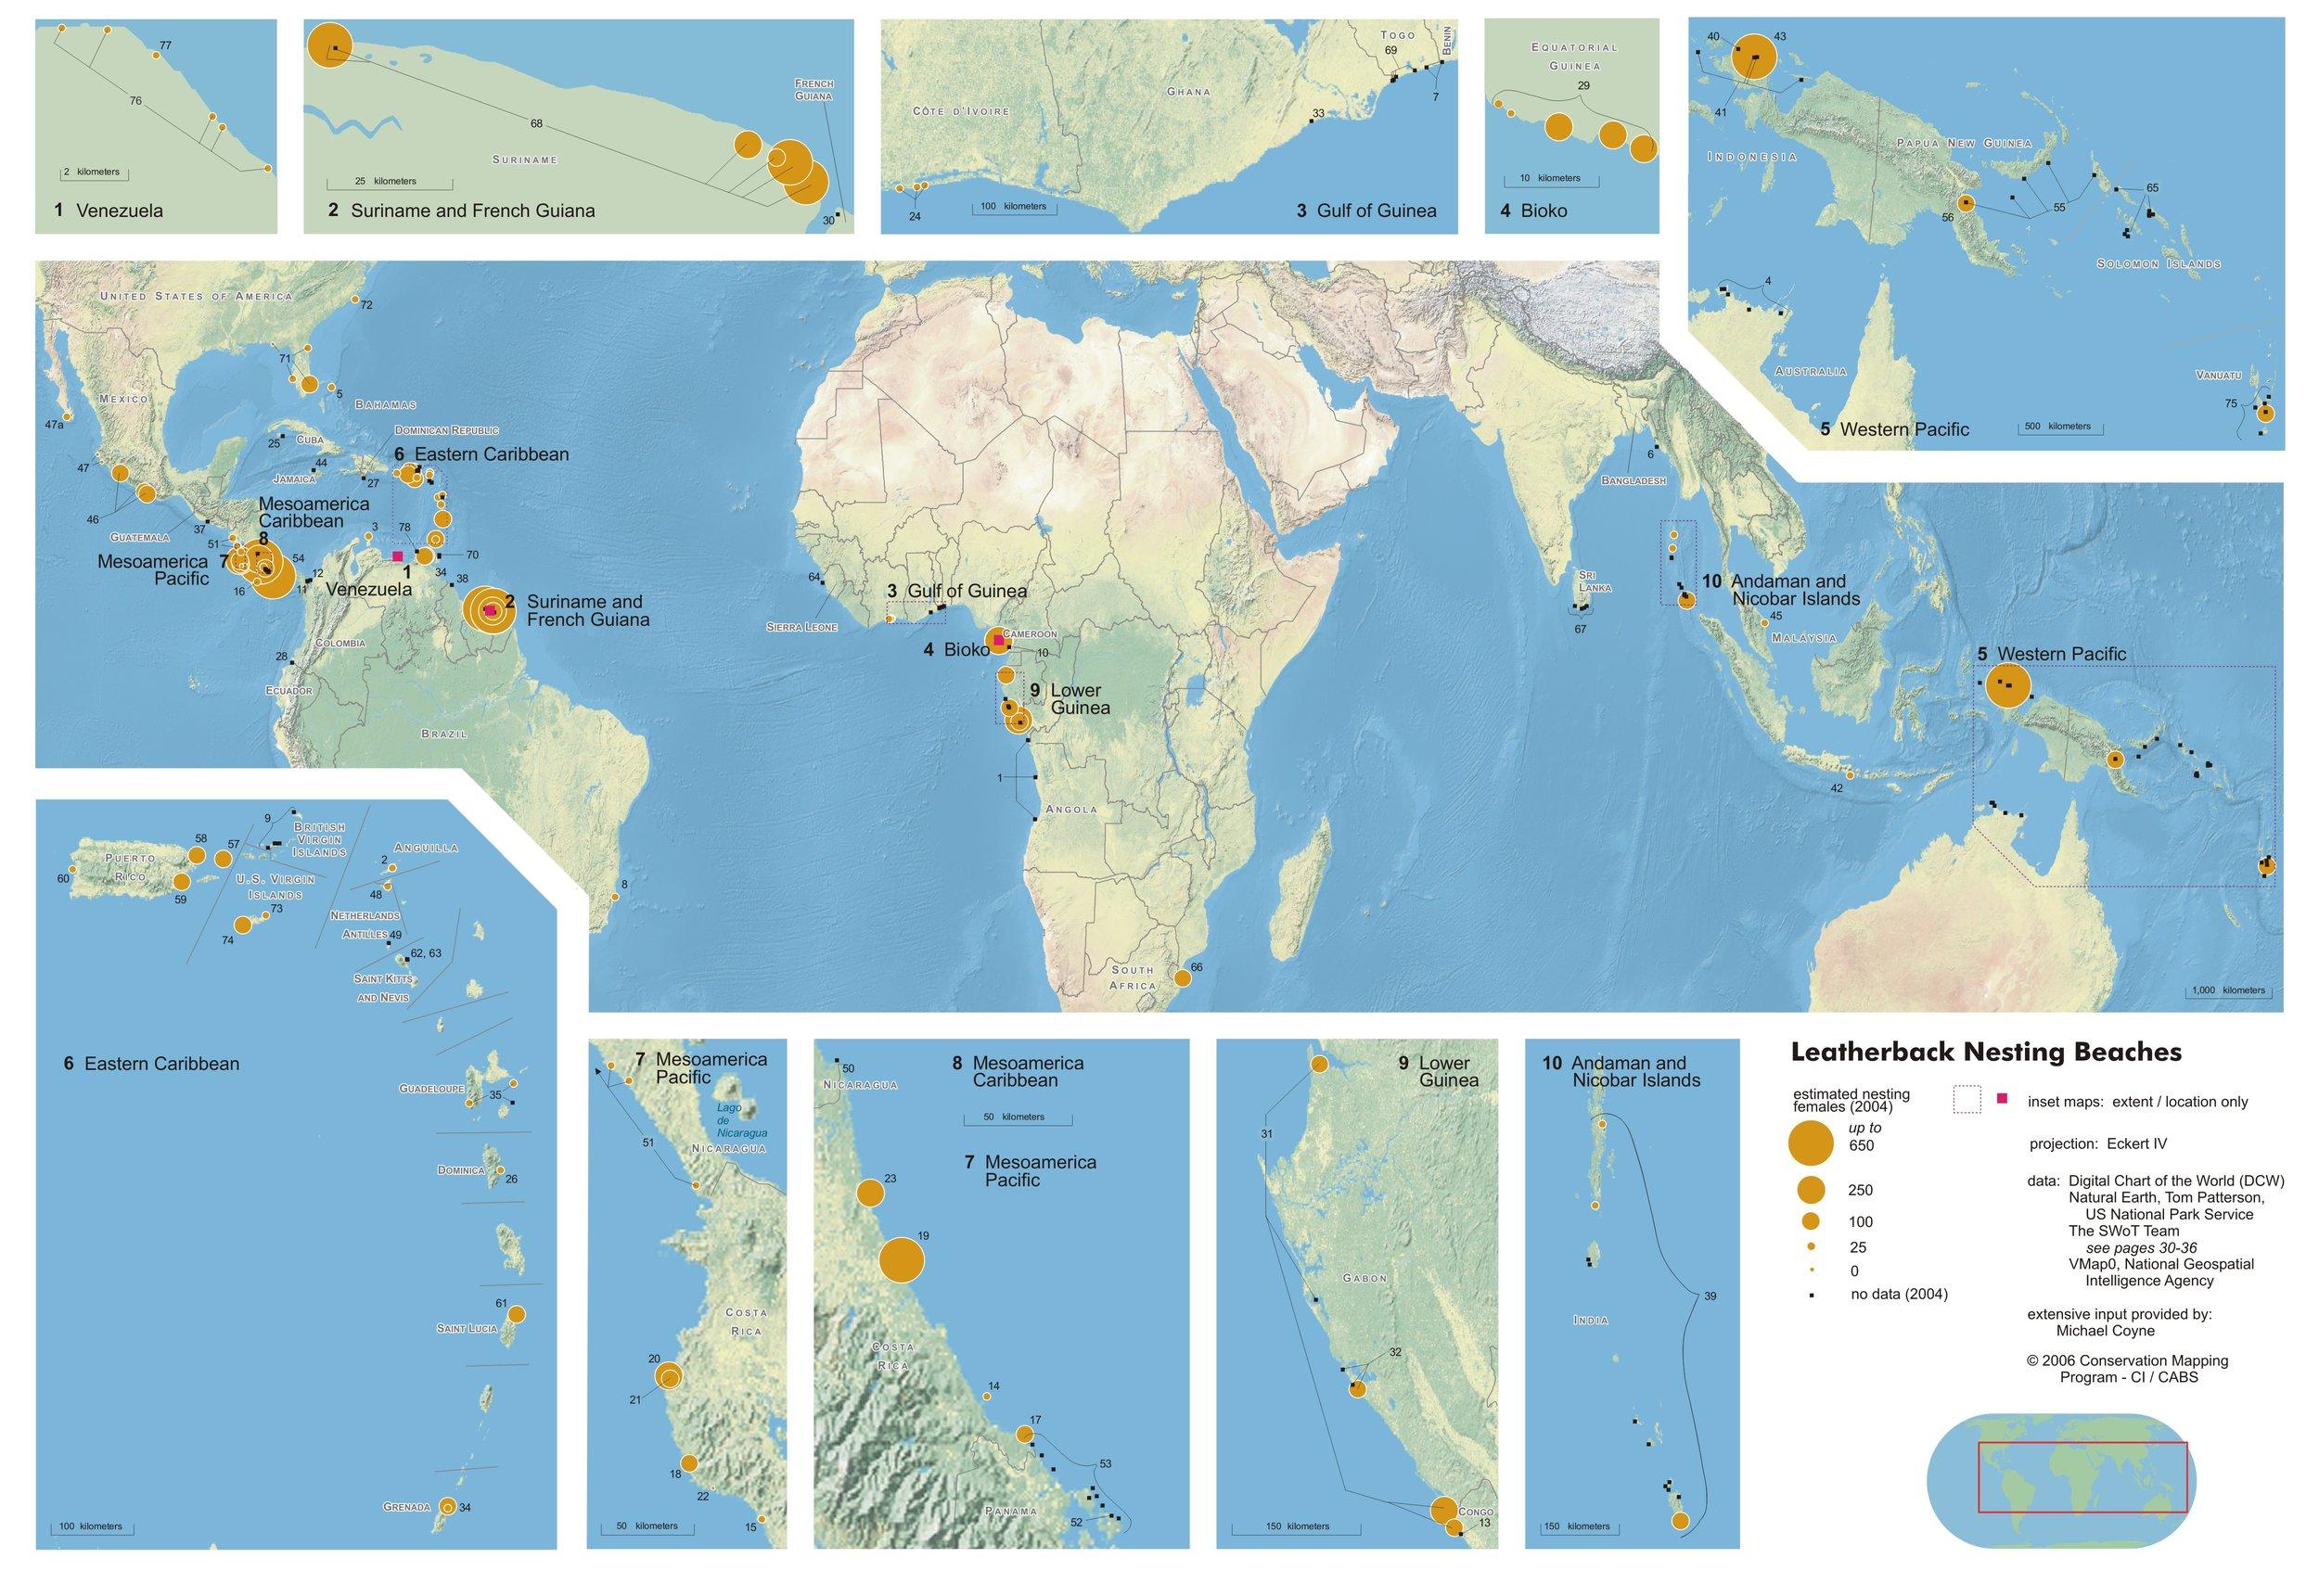 Worldwide Leatherback Nesting Sites 2004 ( data citations ) |  SWOT Report  , vol. I (2006) .